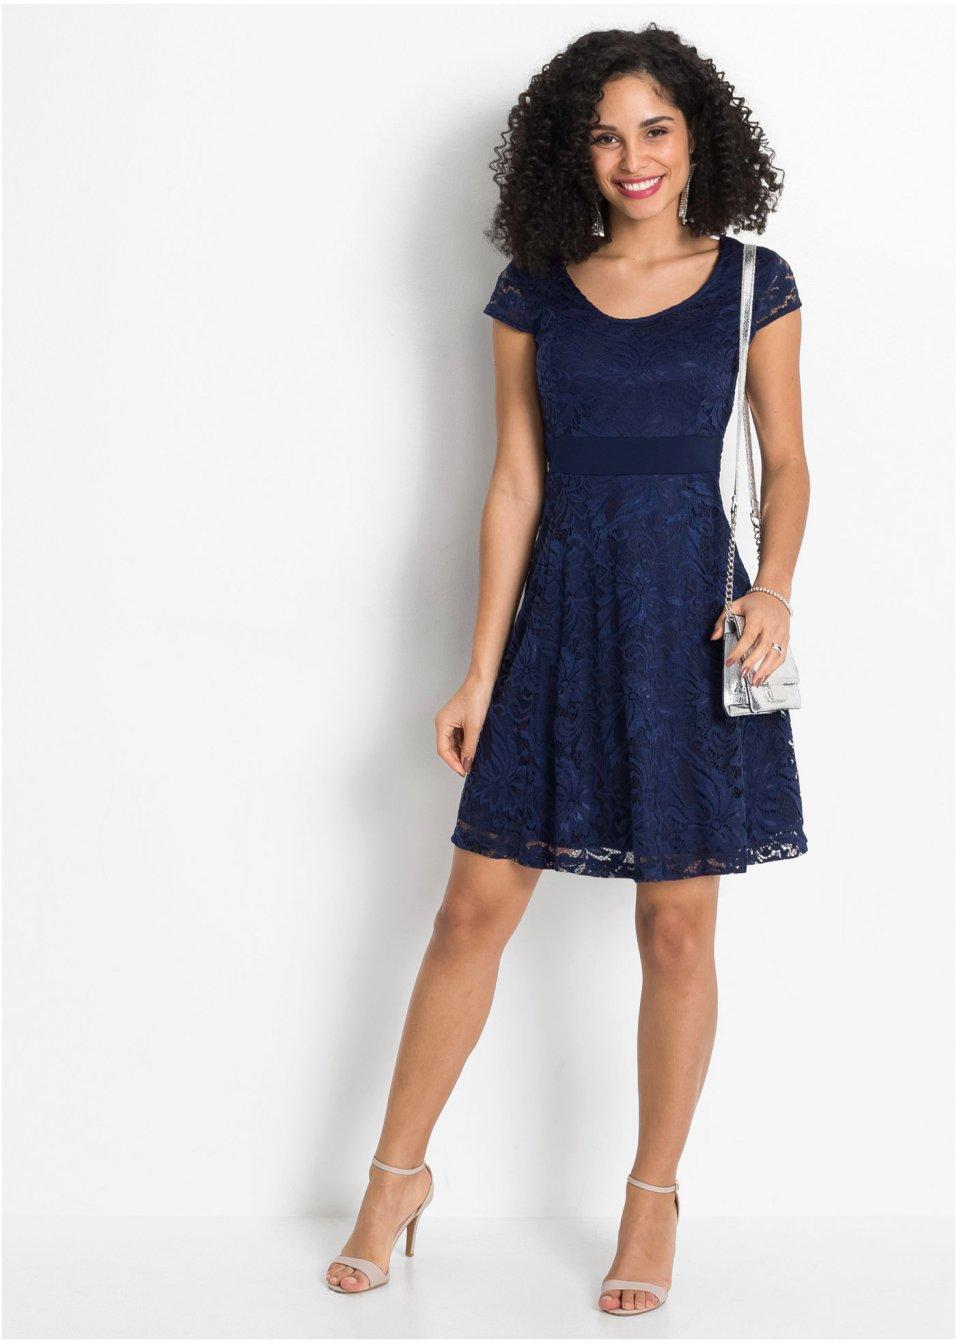 Mode Femme Vêtements DJLfdOFlkj Ravissante robe avec ruban à la taille bleu foncé